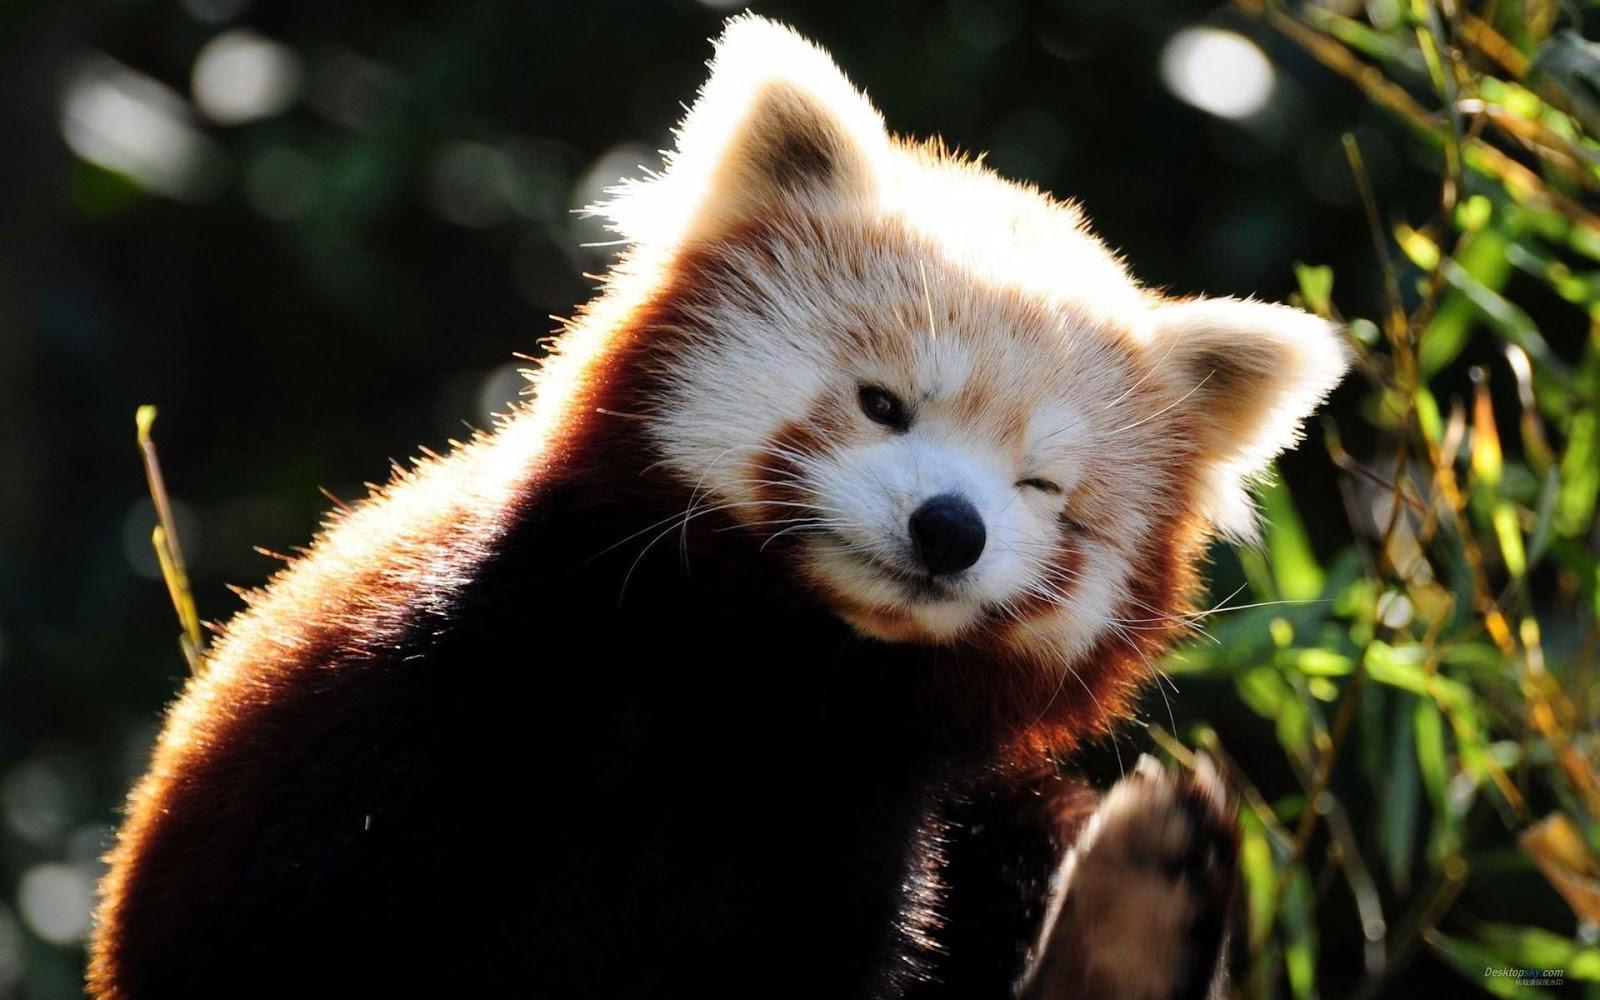 Funny & Cute Red Panda Images